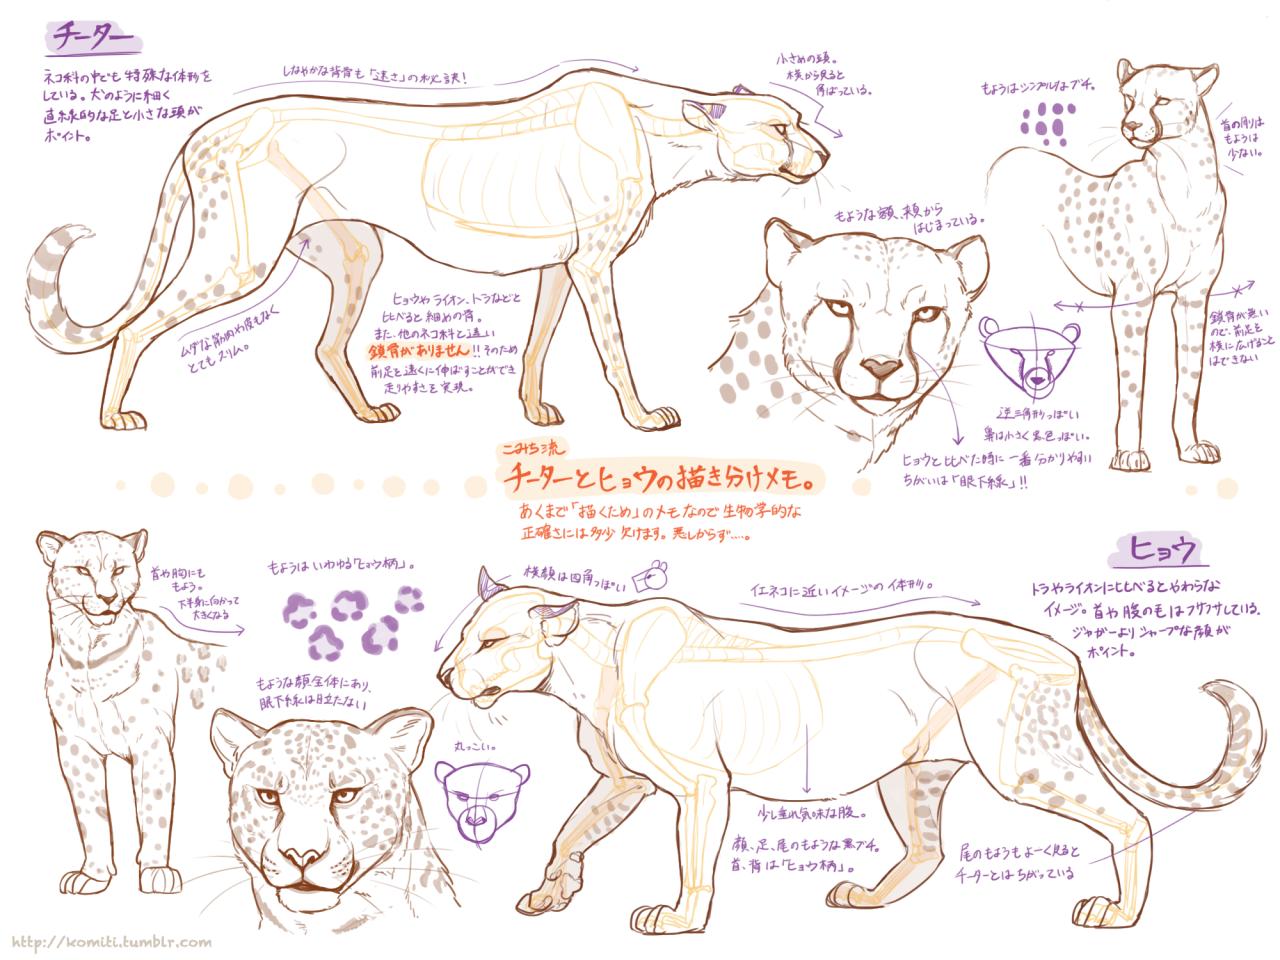 Drawing Leopardo Tuto De Leopardo Bocetos De Animales Dibujos De Animales Ilustracion De Leon